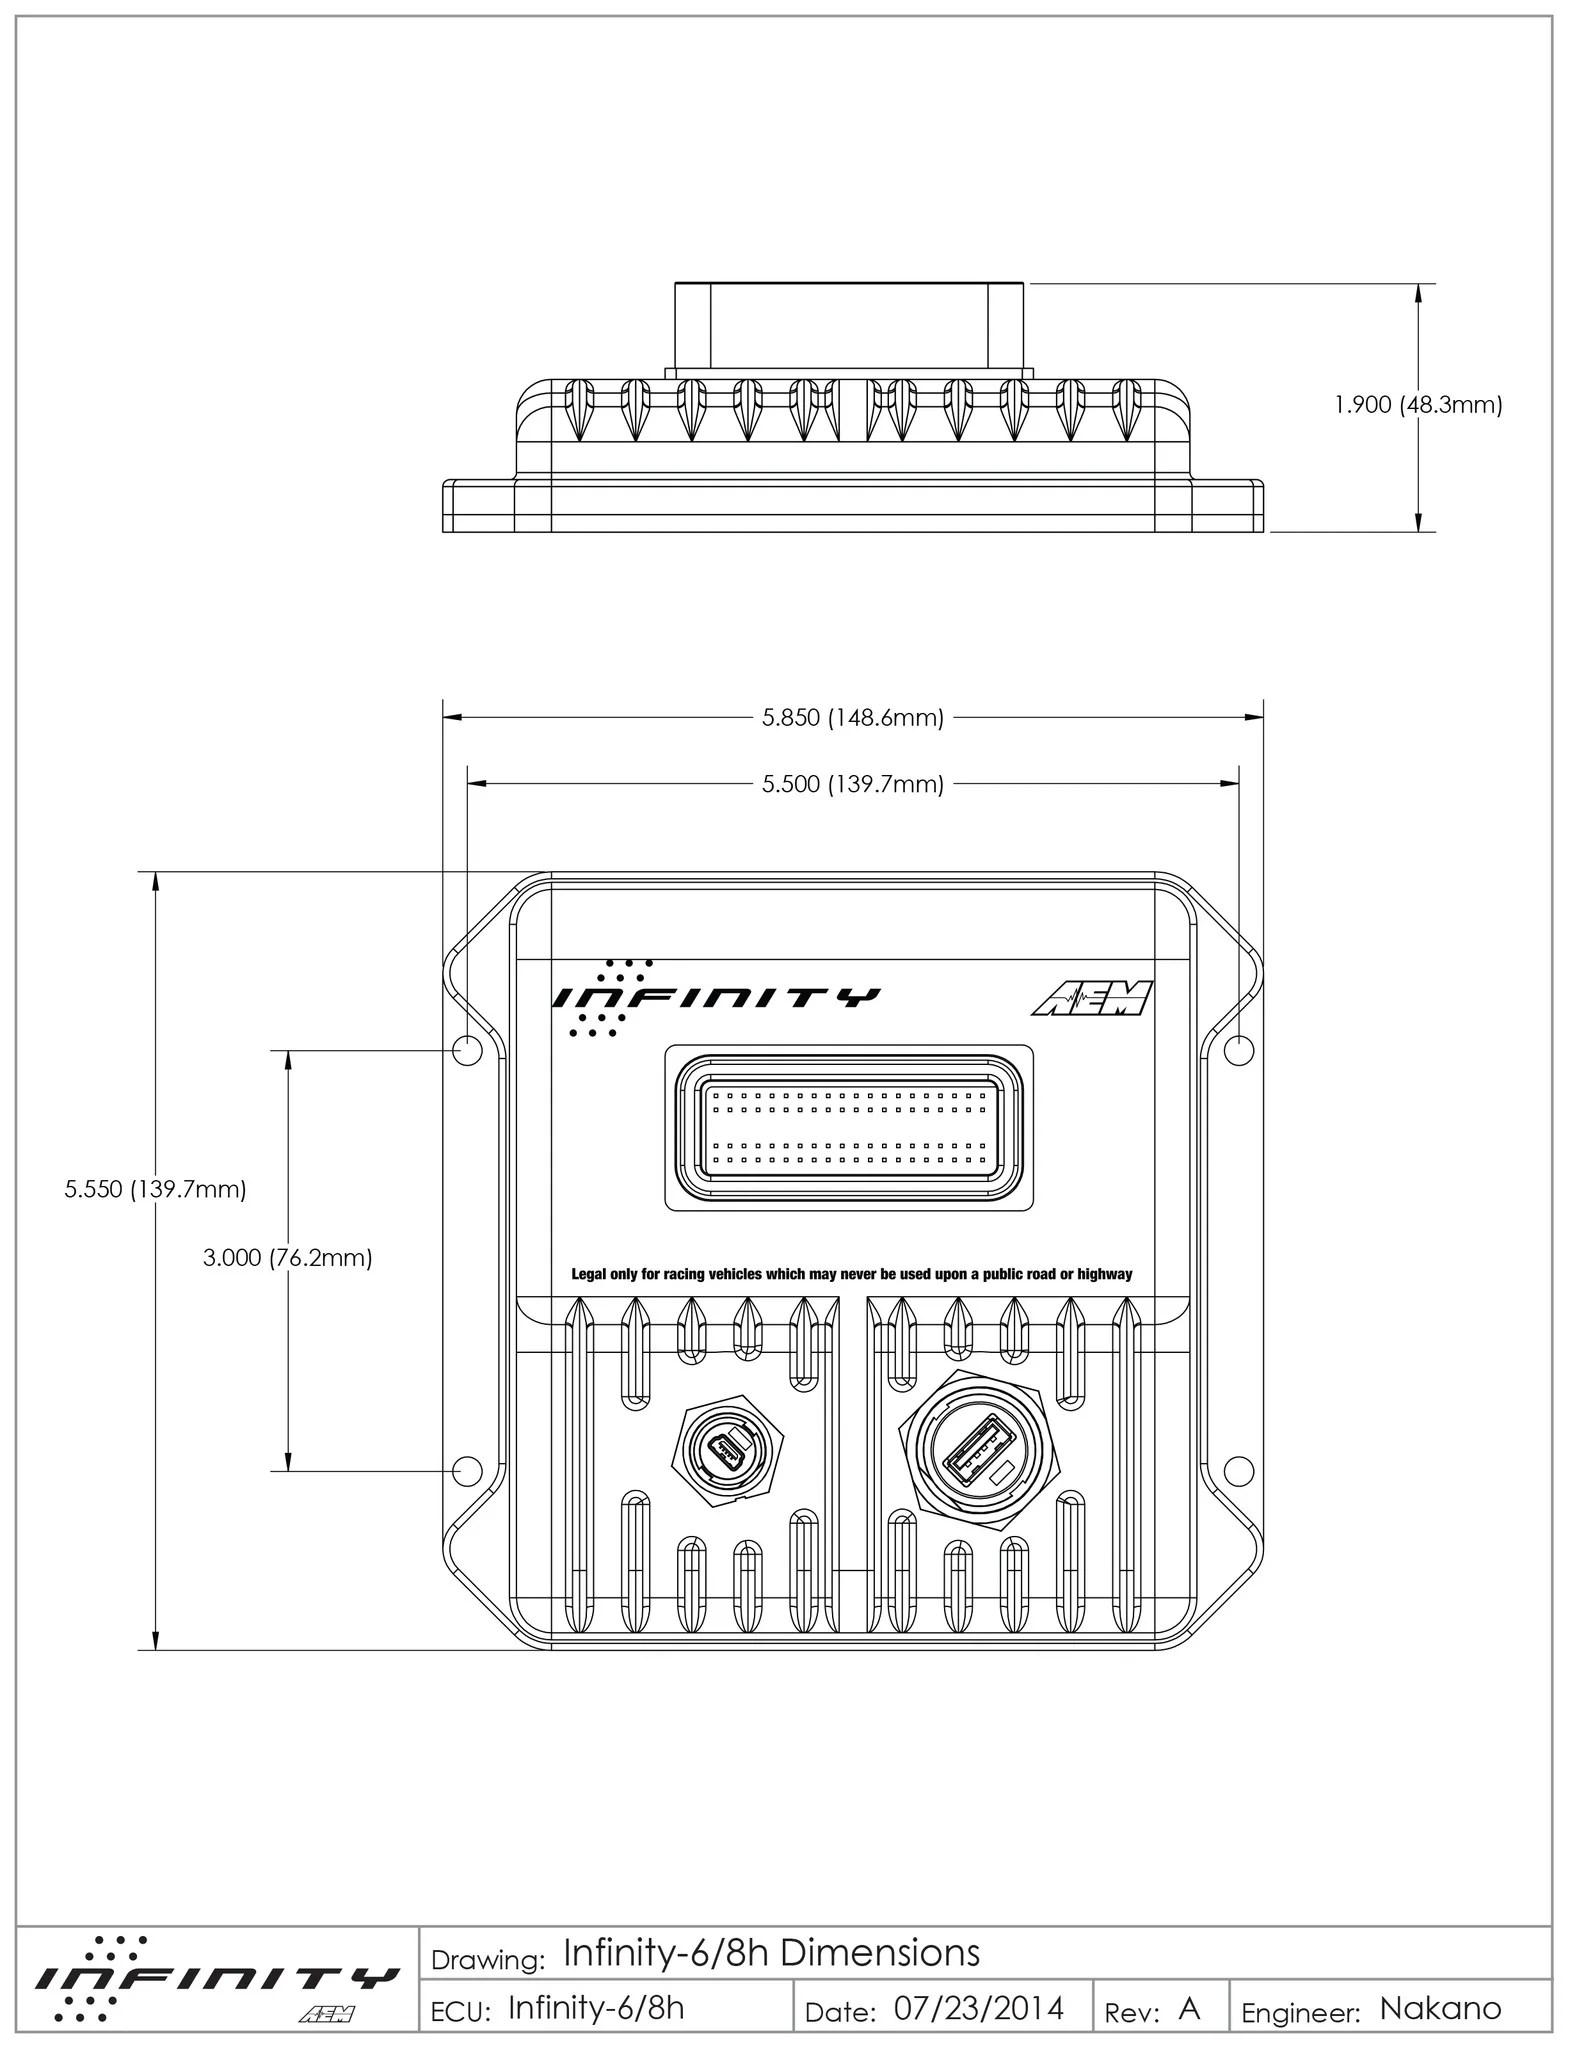 aem infinity series 5 engine management nemos garage com 2001 grand am 3 4 engine infinity [ 1570 x 2048 Pixel ]